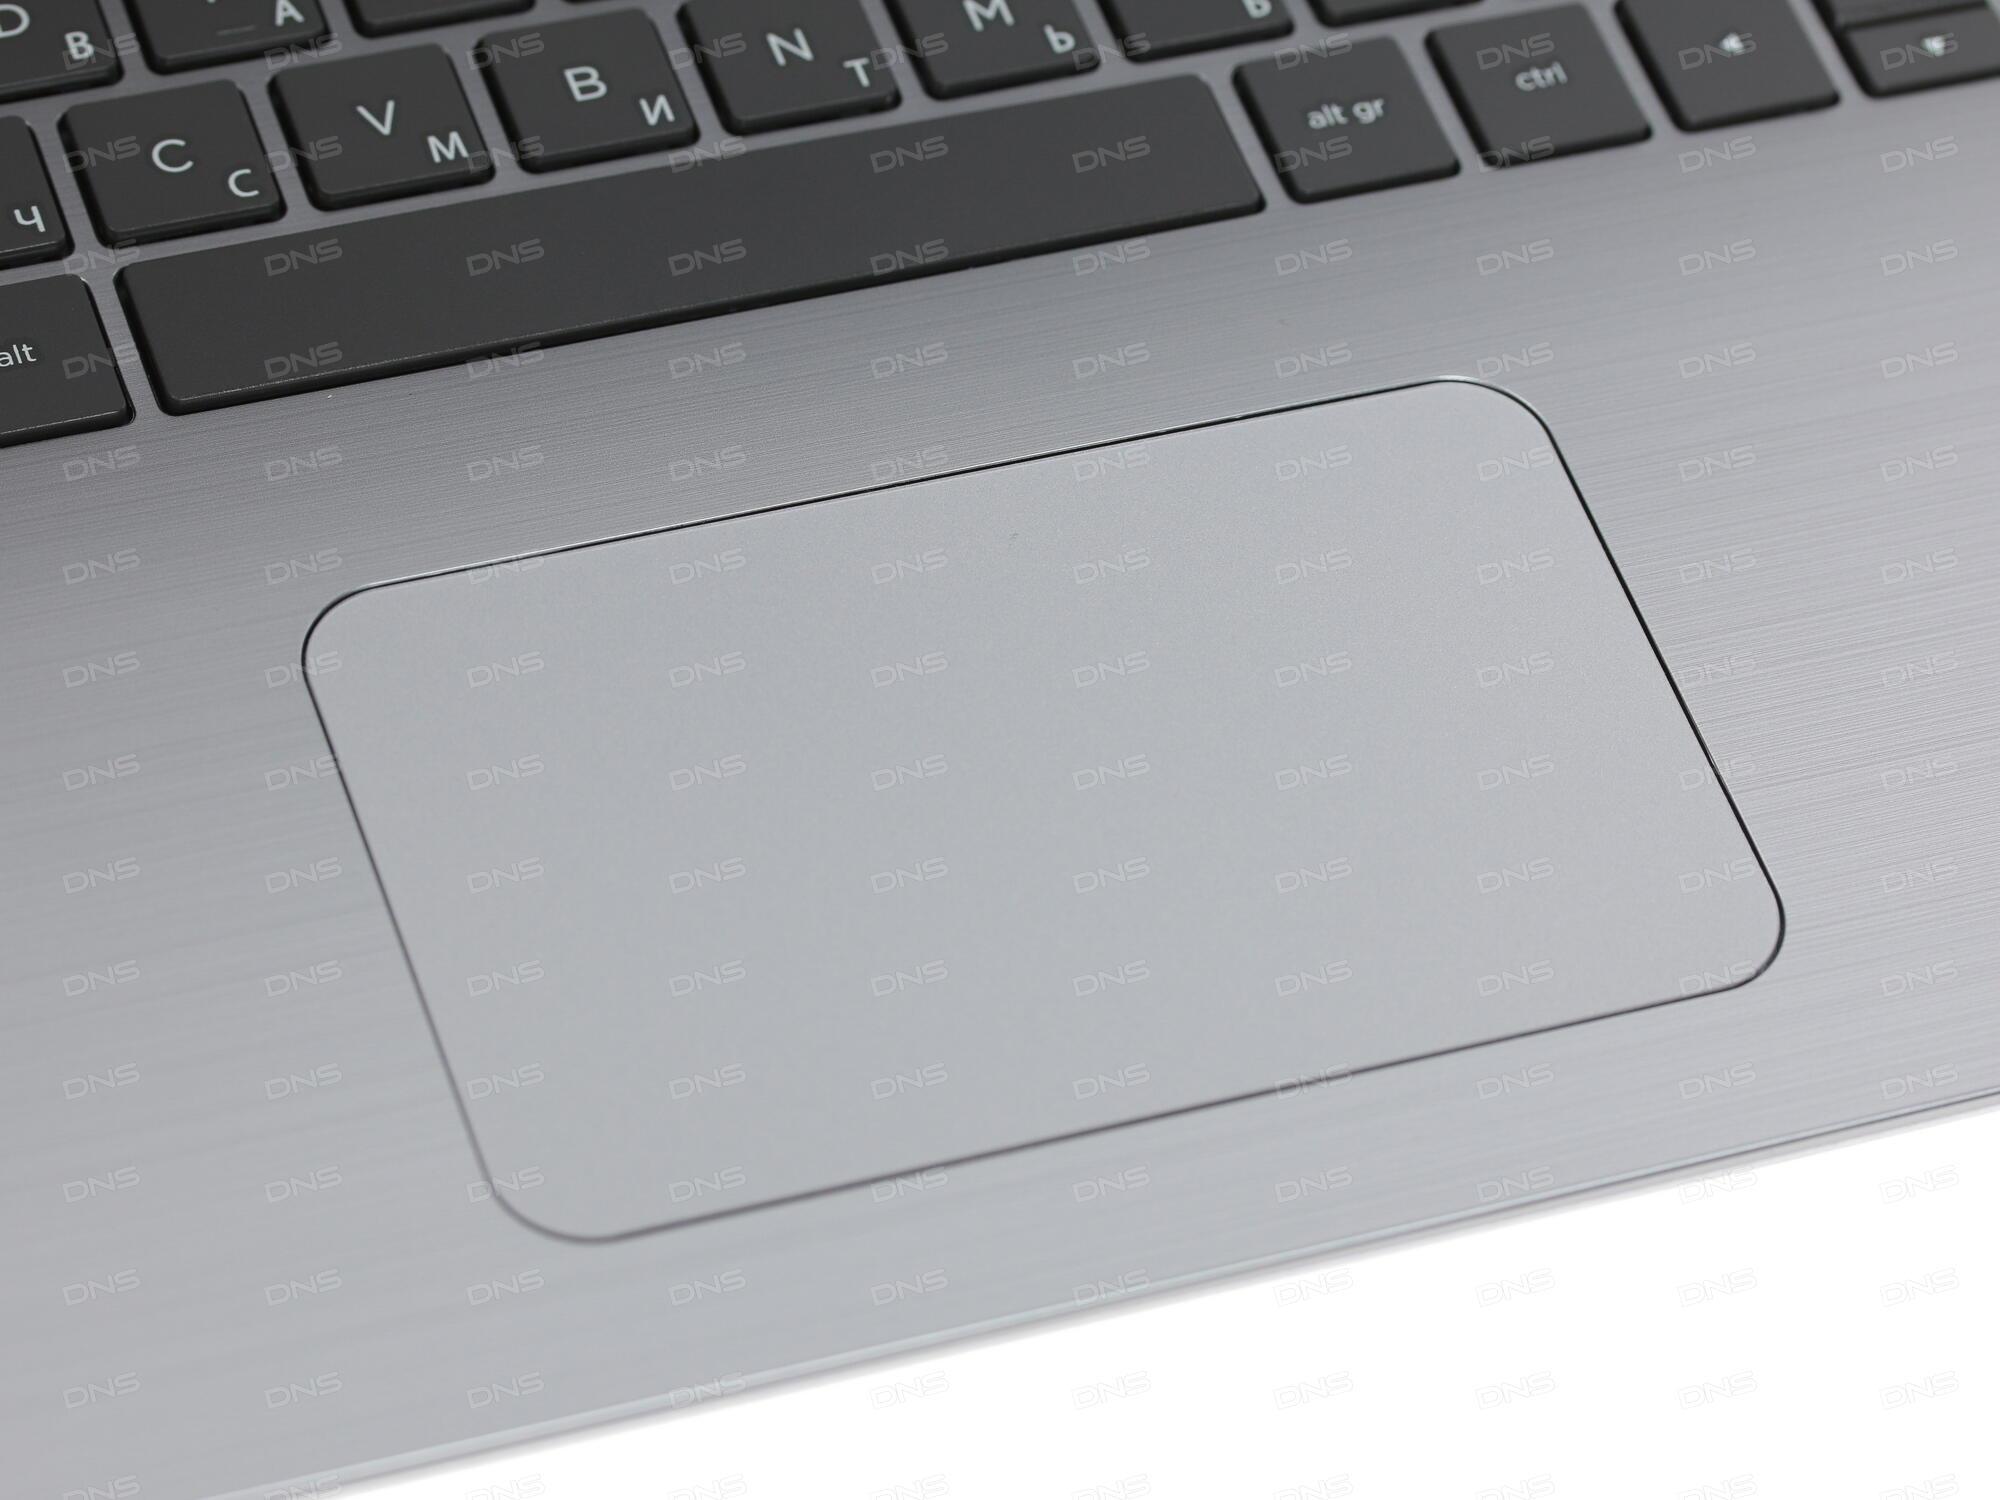 Ноутбук HP 17-bs028ur 2CS57EA (Intel Pentium N3710 1.6 GHz/4096Mb/1000Gb/DVD-RW/AMD Radeon 520 2048Mb/Wi-Fi/Cam/17.3/1600x900/DOS)